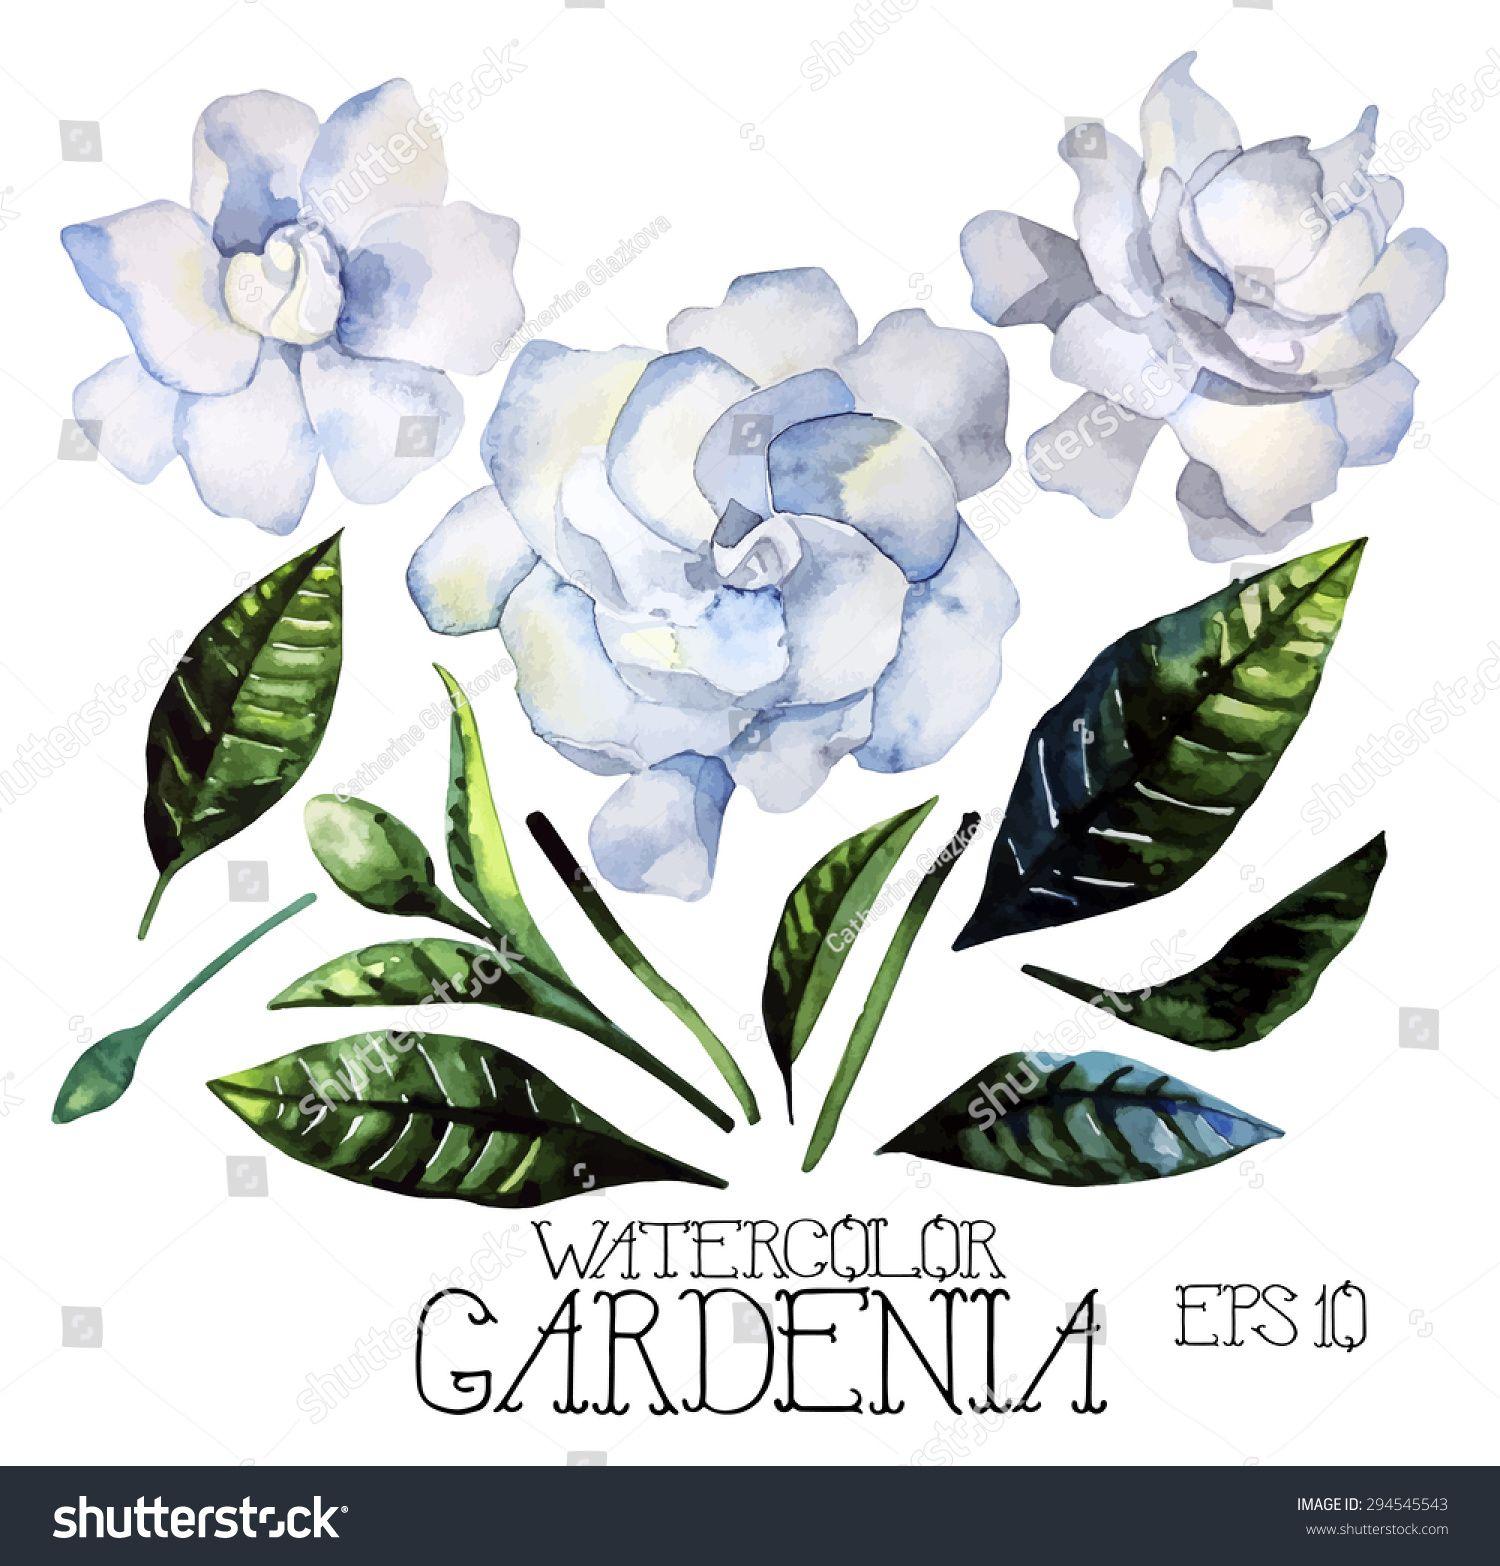 Watercolor Gardenia Set Vector Design Elements Isolated On White Background Gardenia Watercolor Free Vector Art